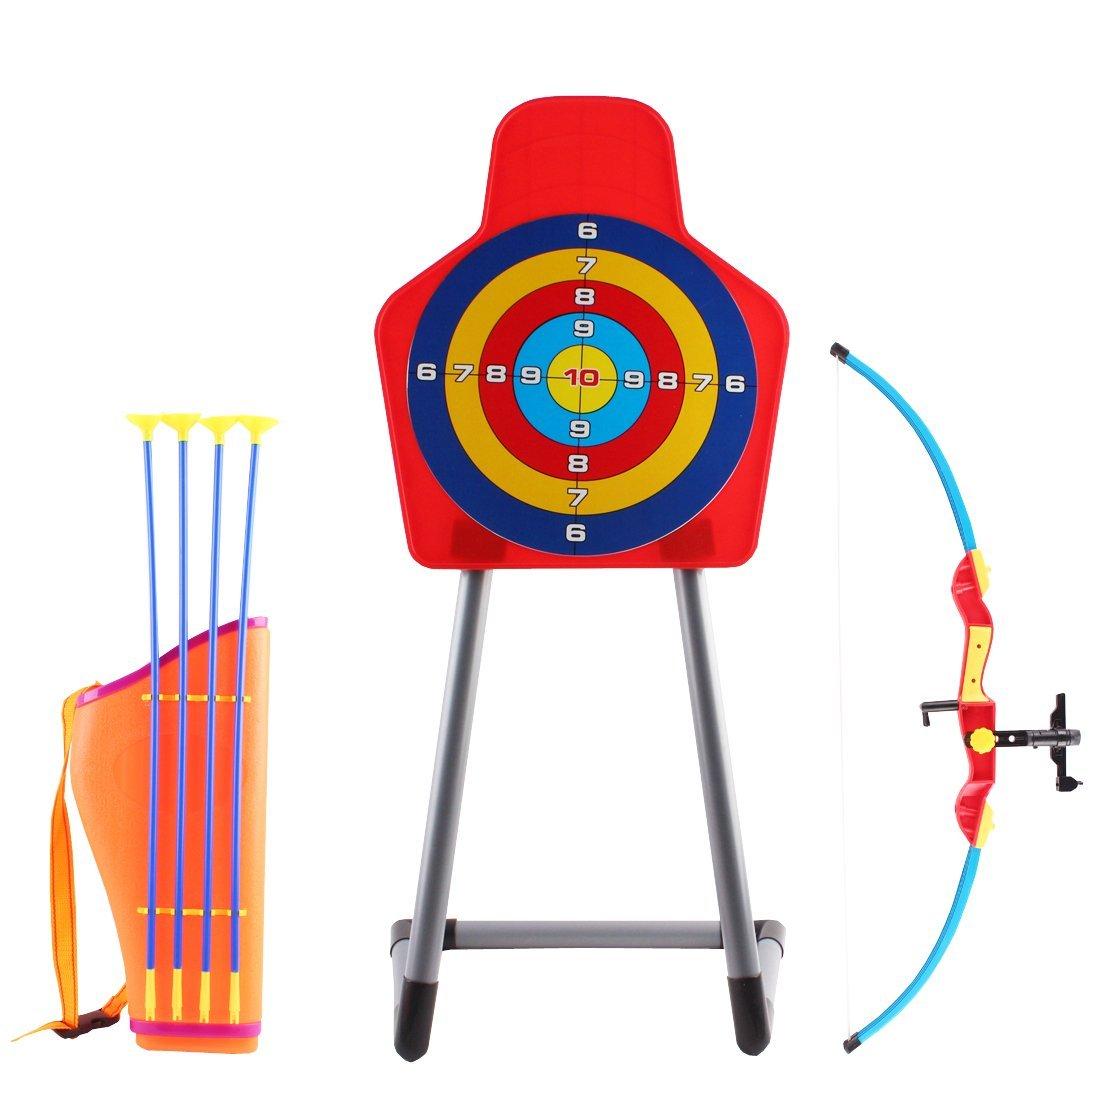 Juego infantil tiro al blanco deAO